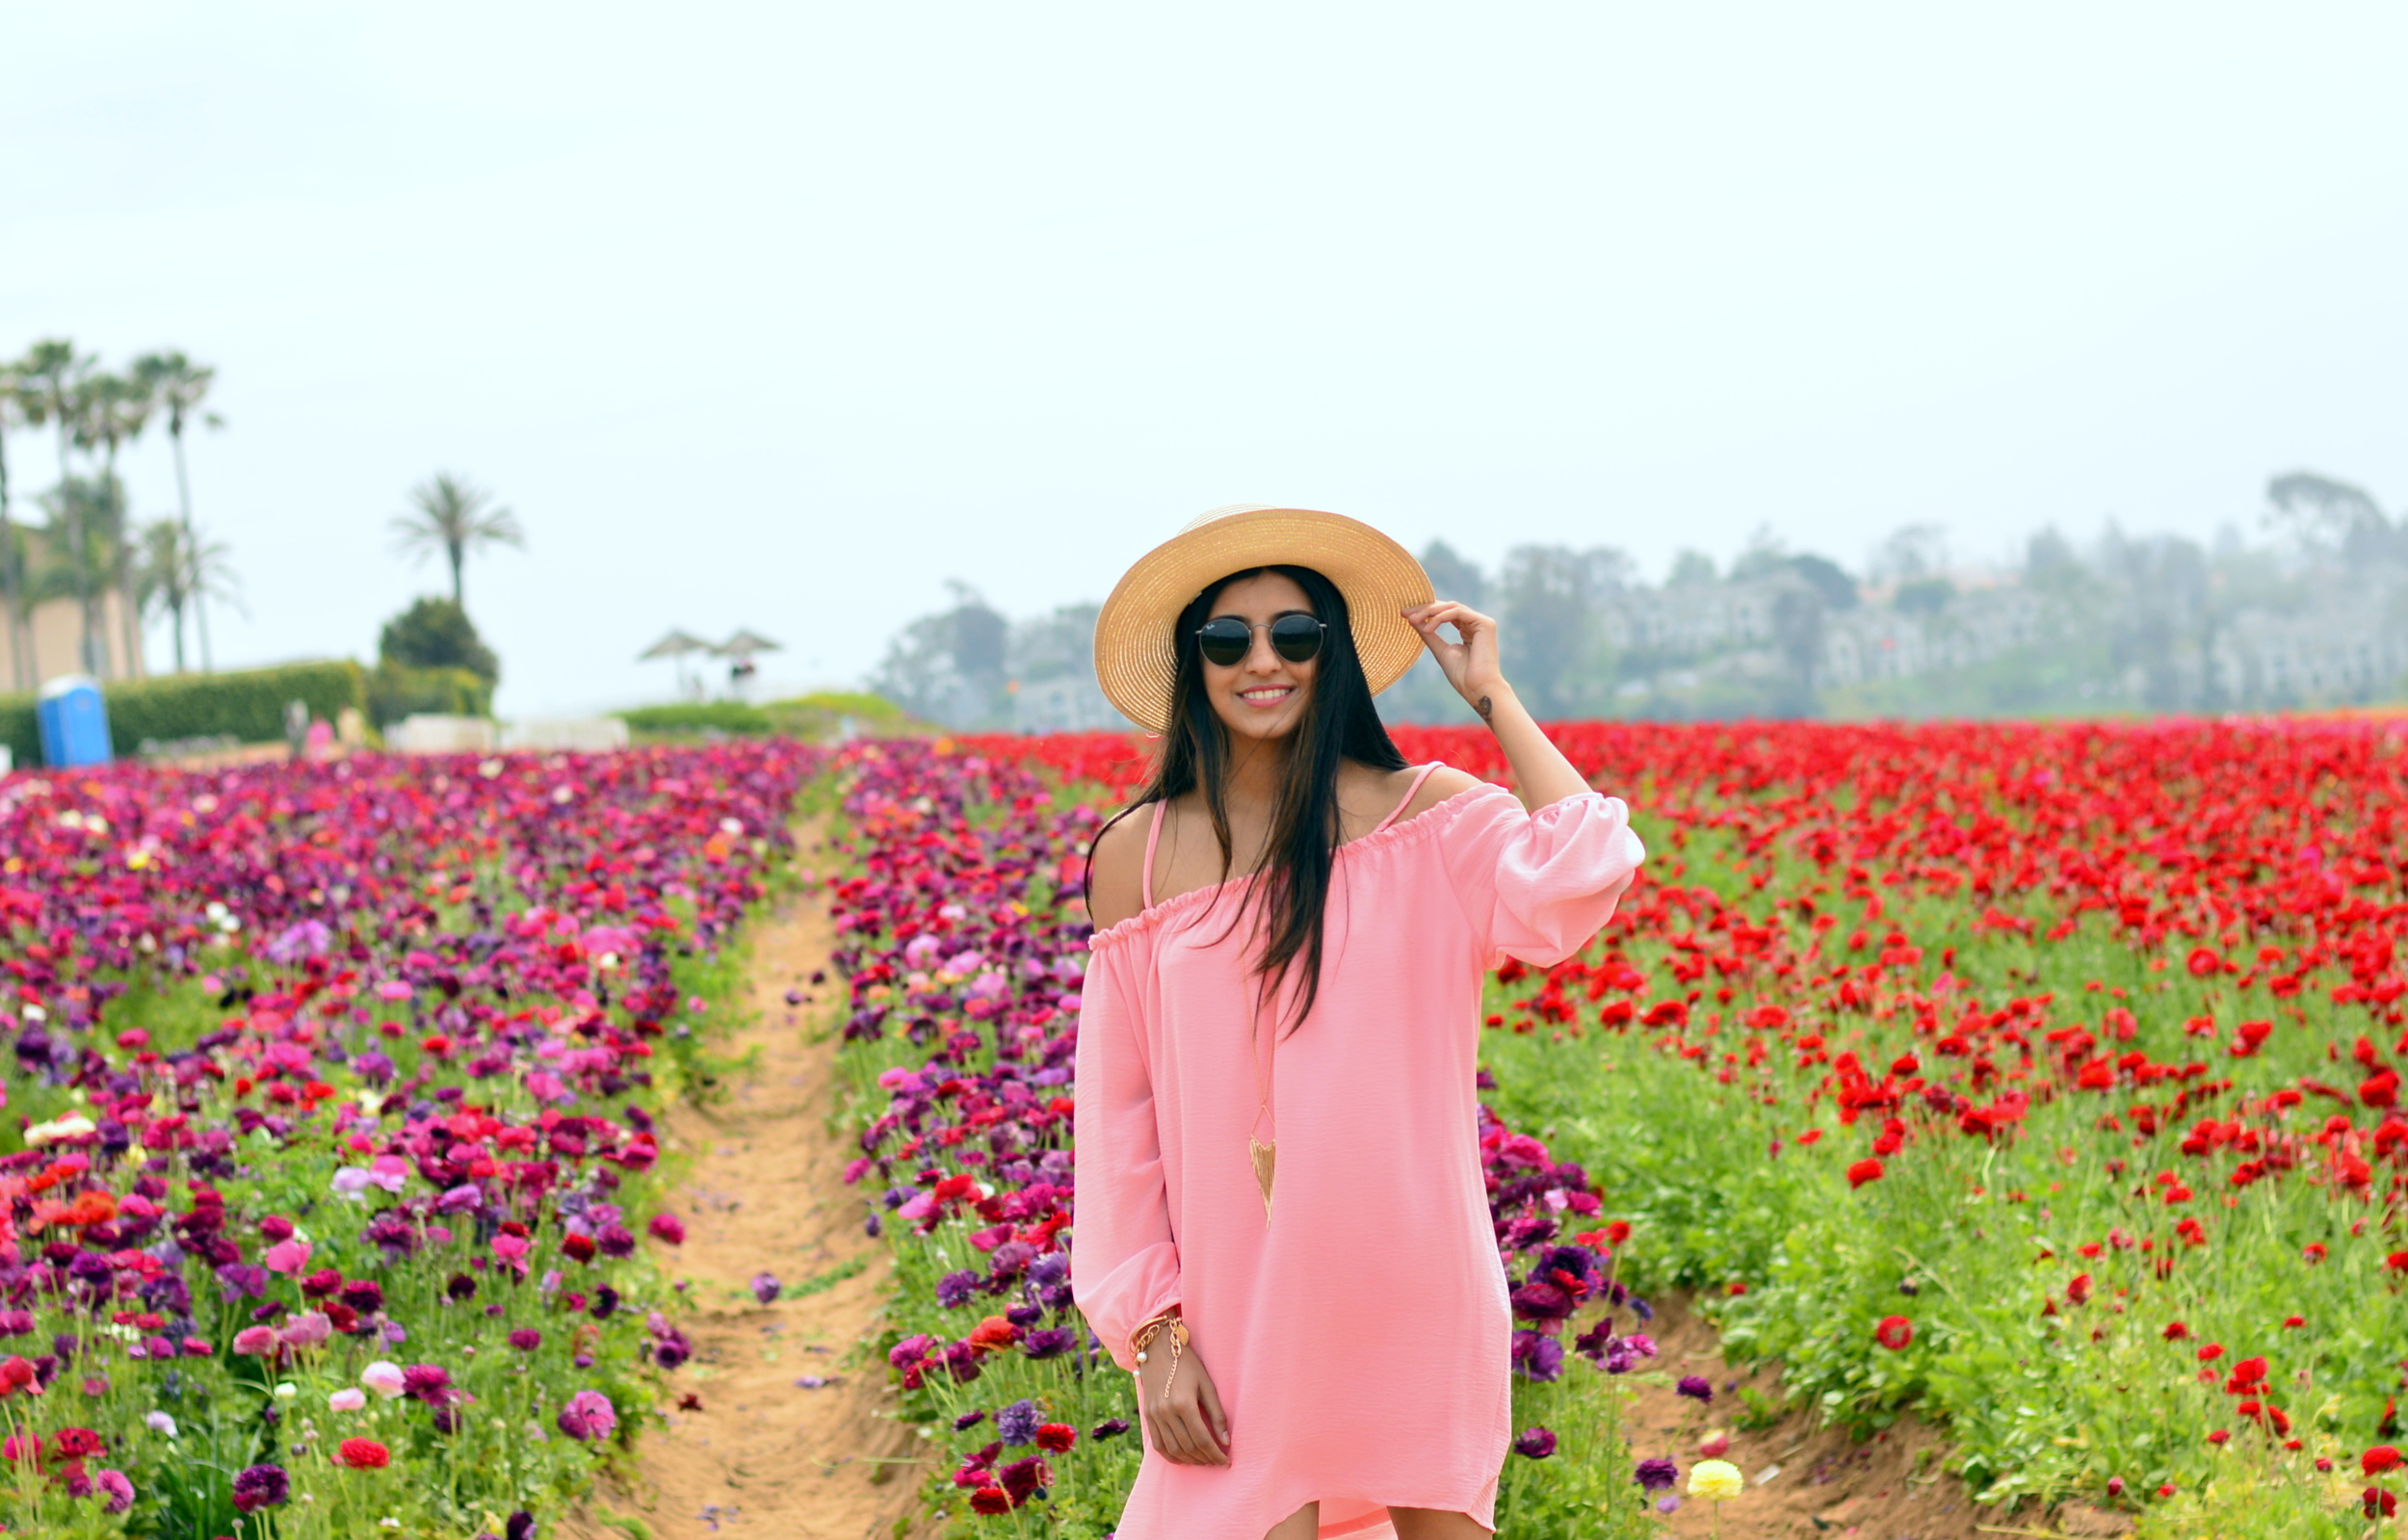 off-shoulder-dress-boho-festival-style-spring-outfit